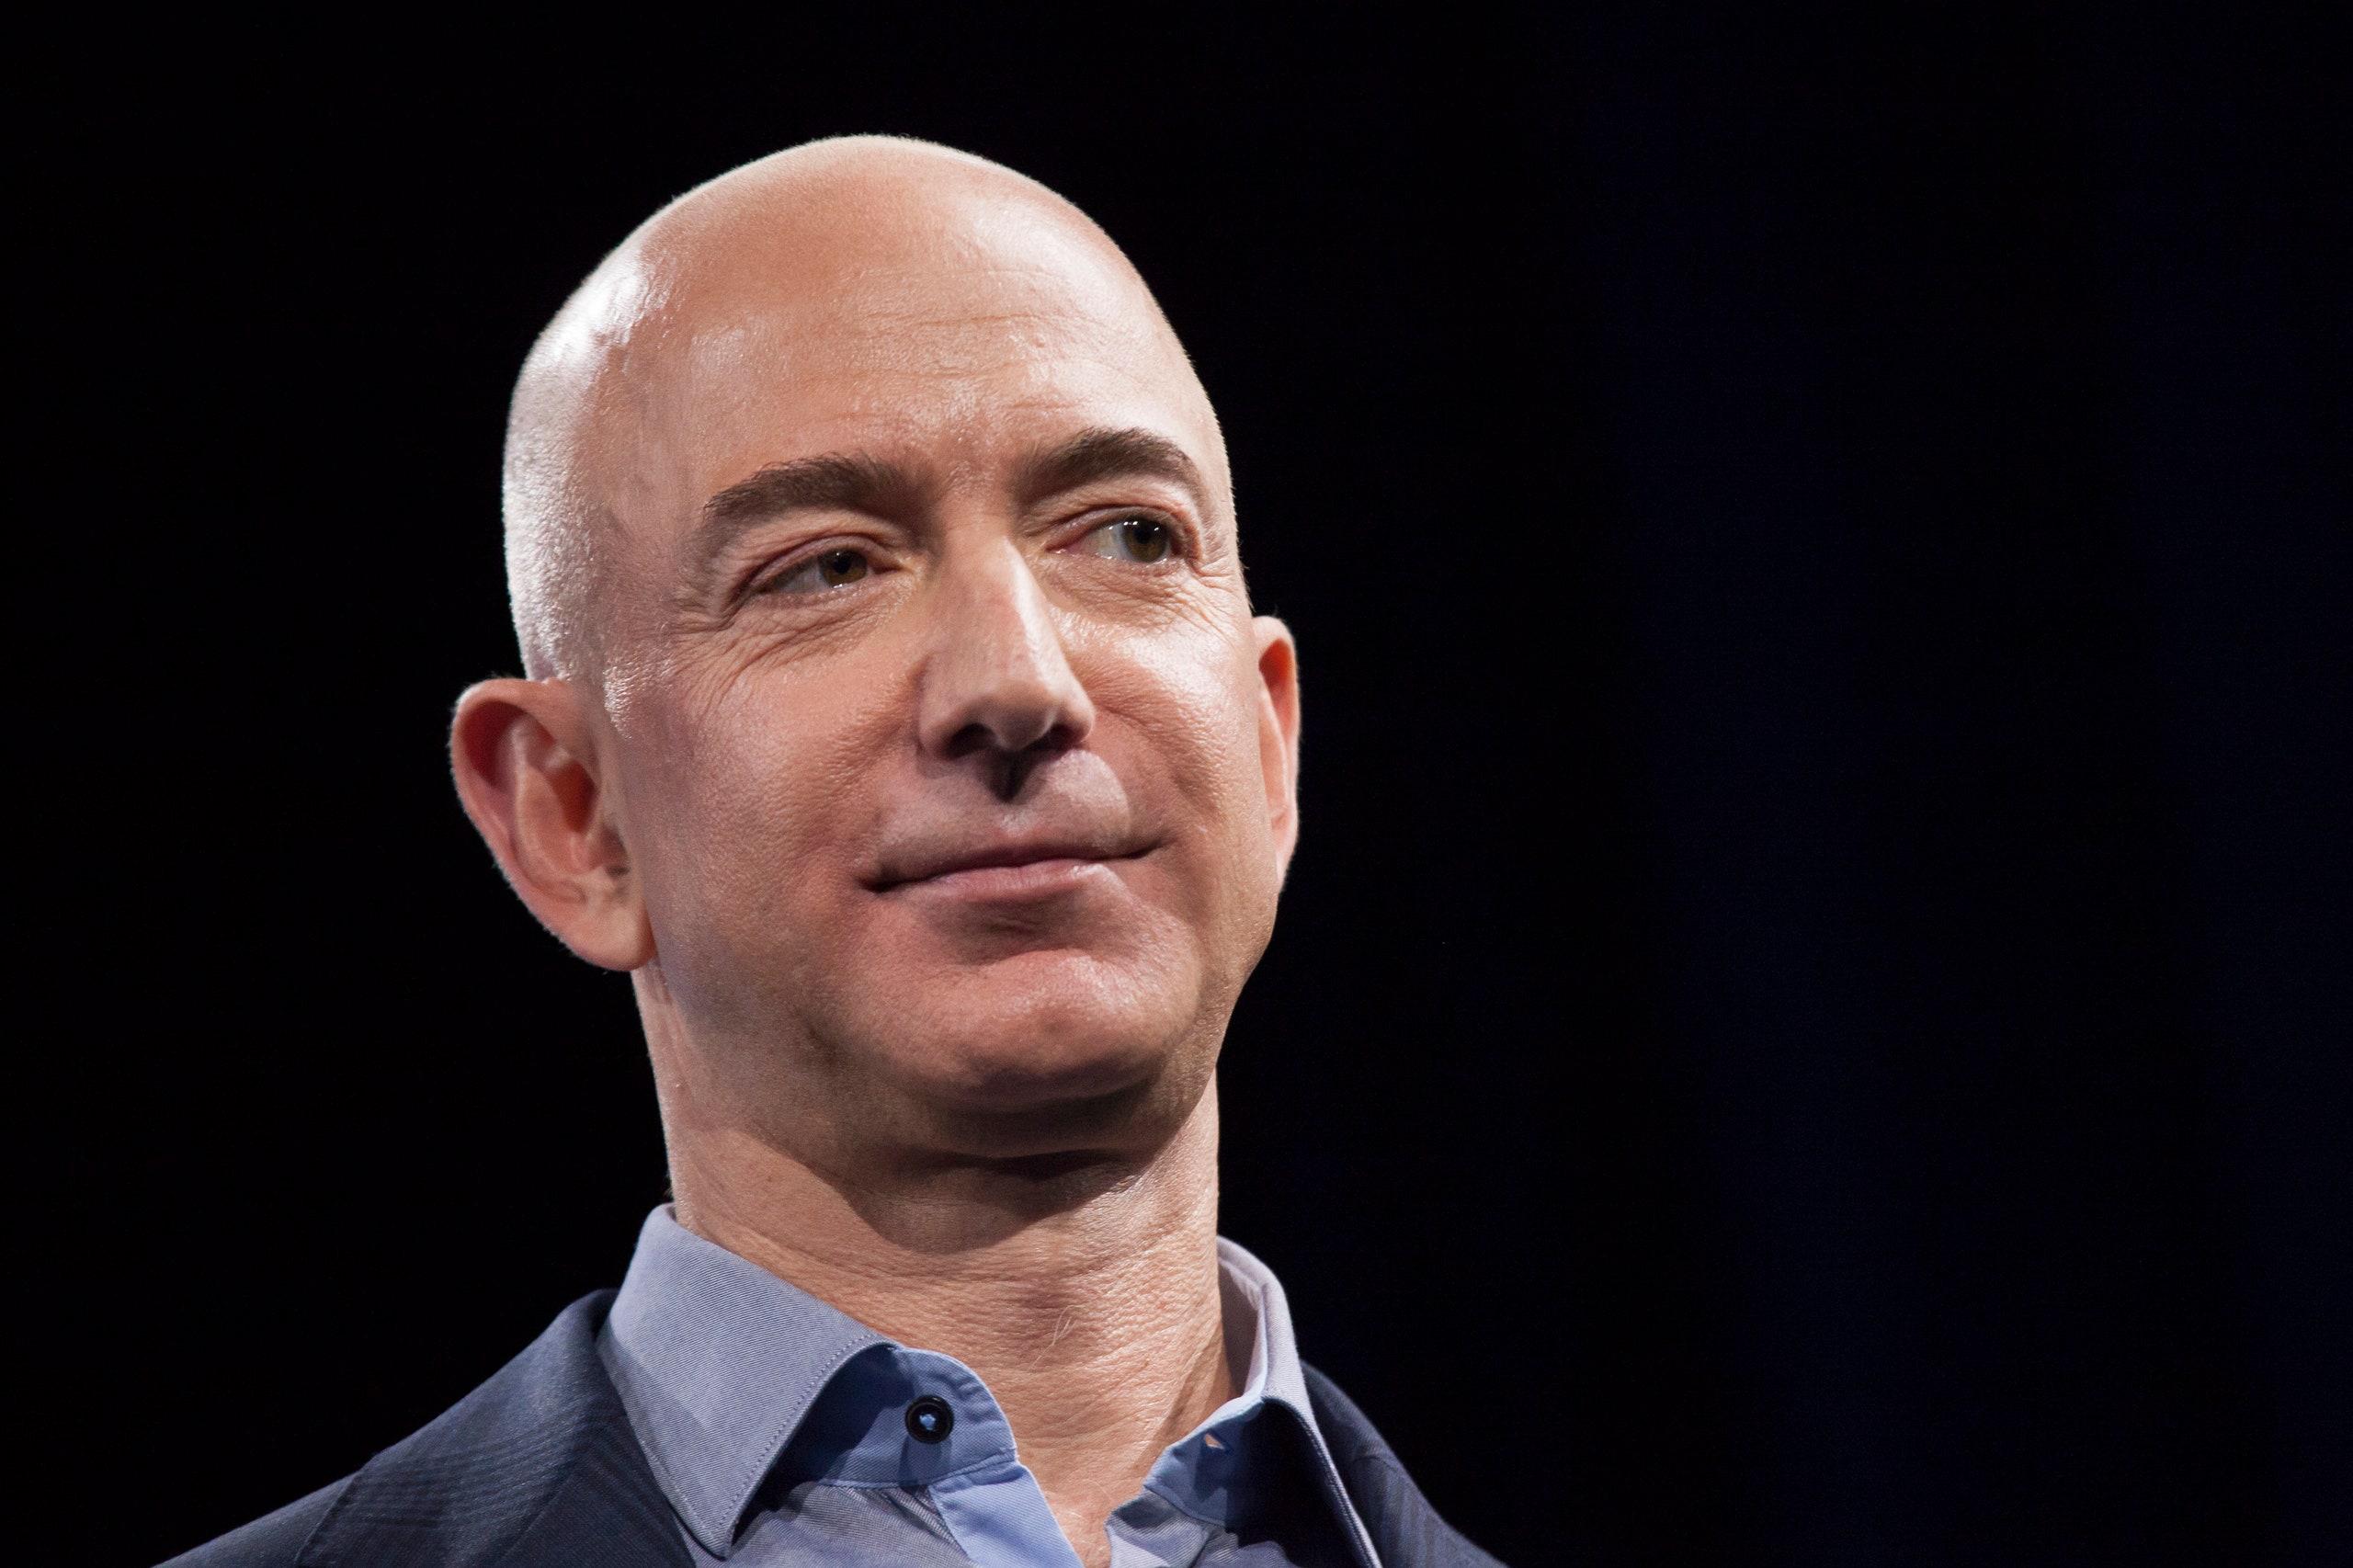 Jeff Bezos - Founder of Blue Origin